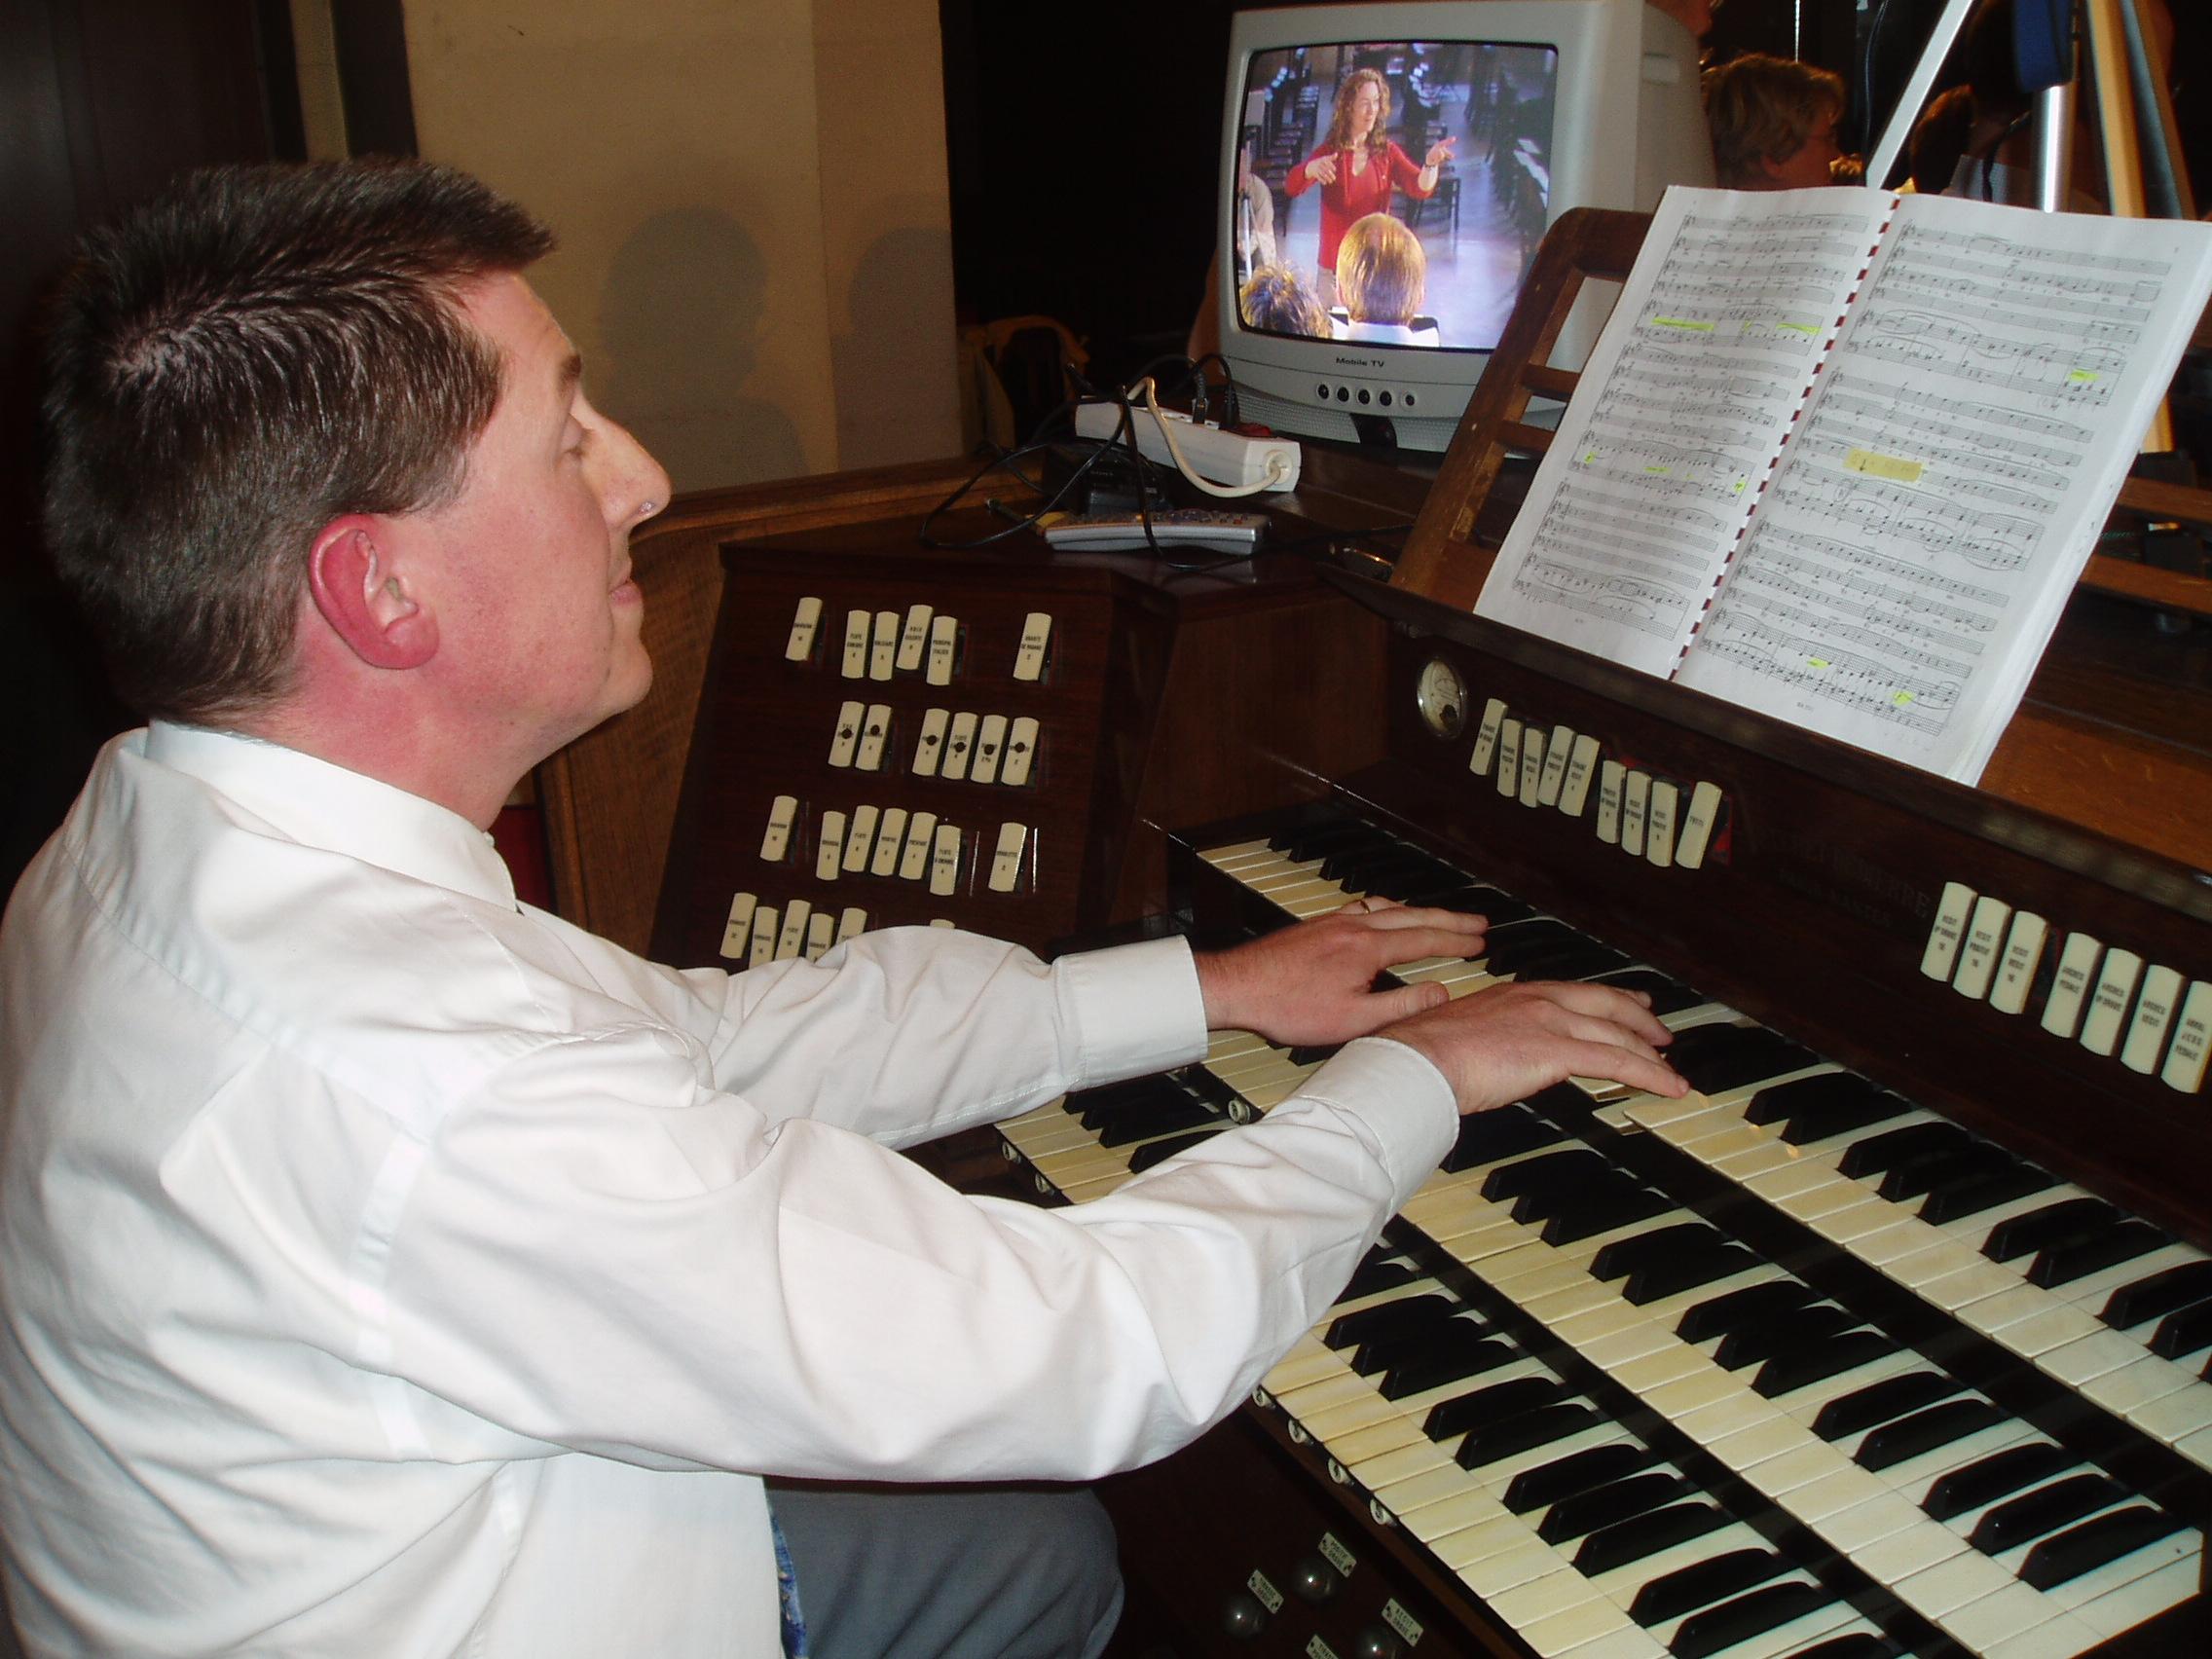 Pierre Desmytter mai 2006 2.JPG